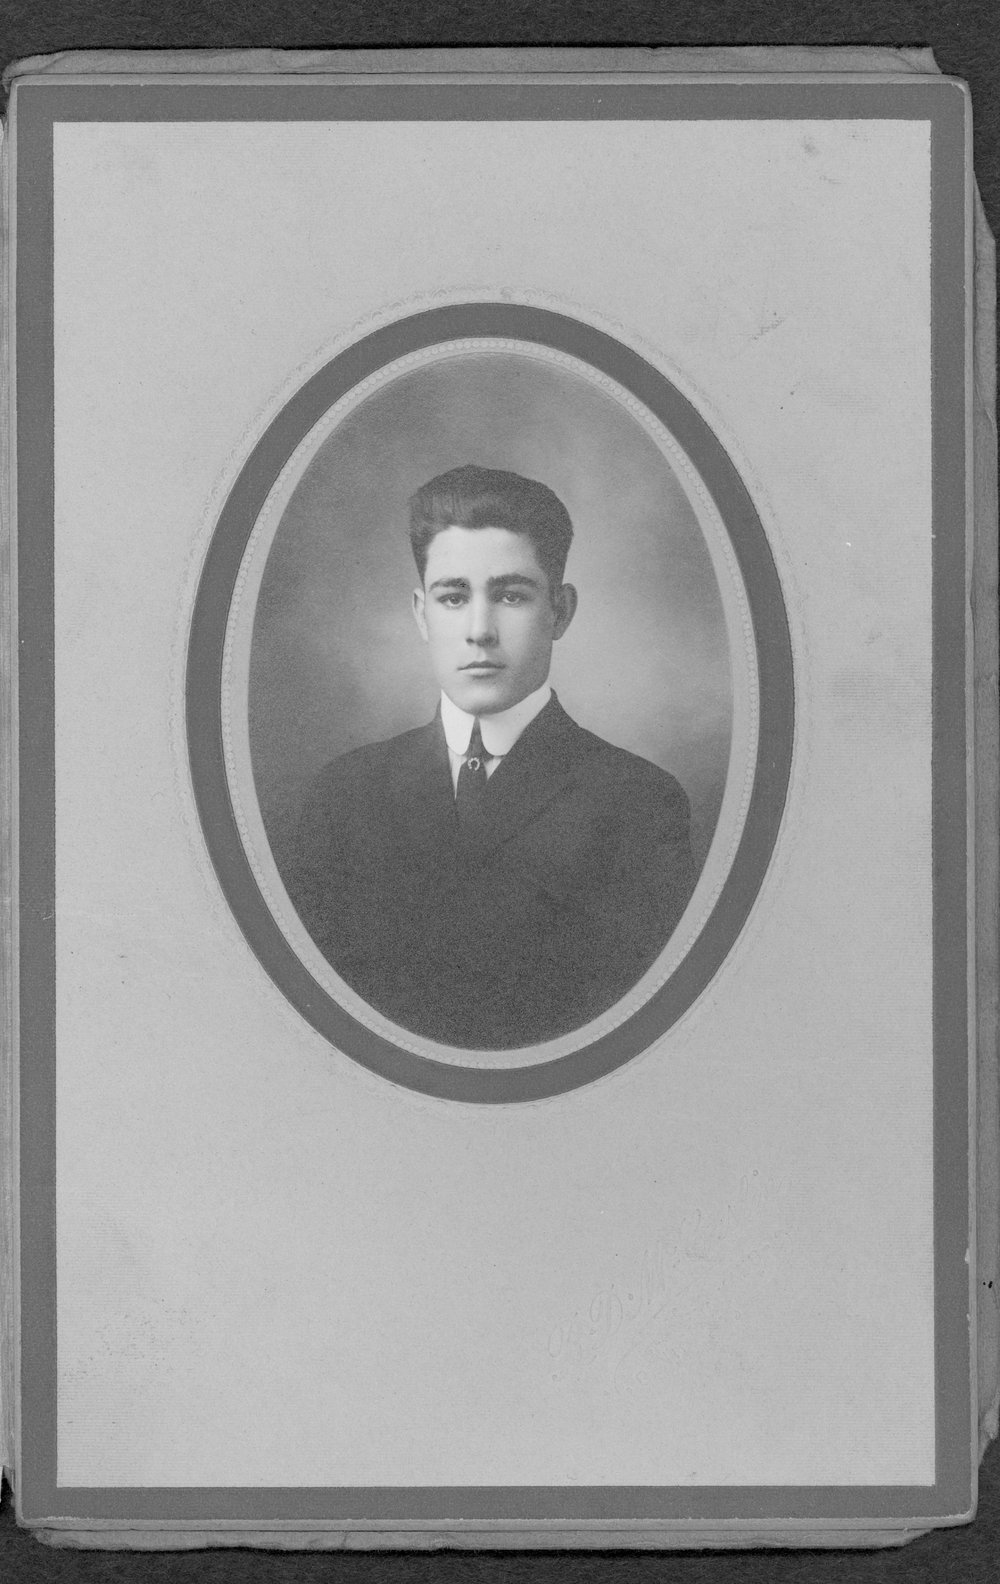 Robert Bryan Greene, World War I soldier - 3